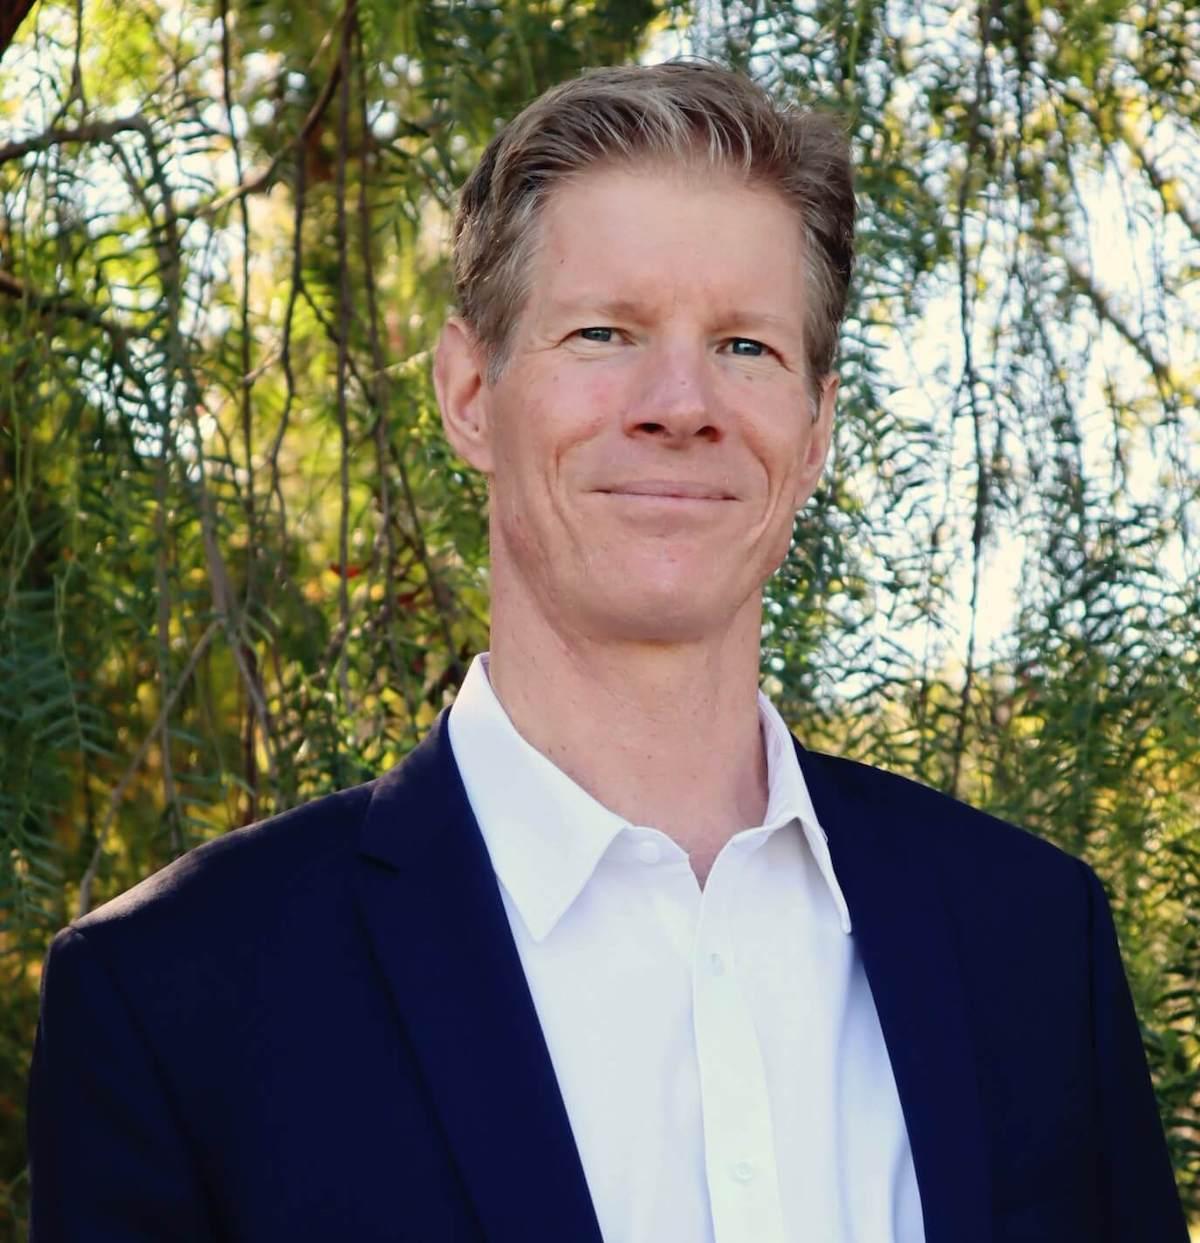 Thomas A. Derse, CFA